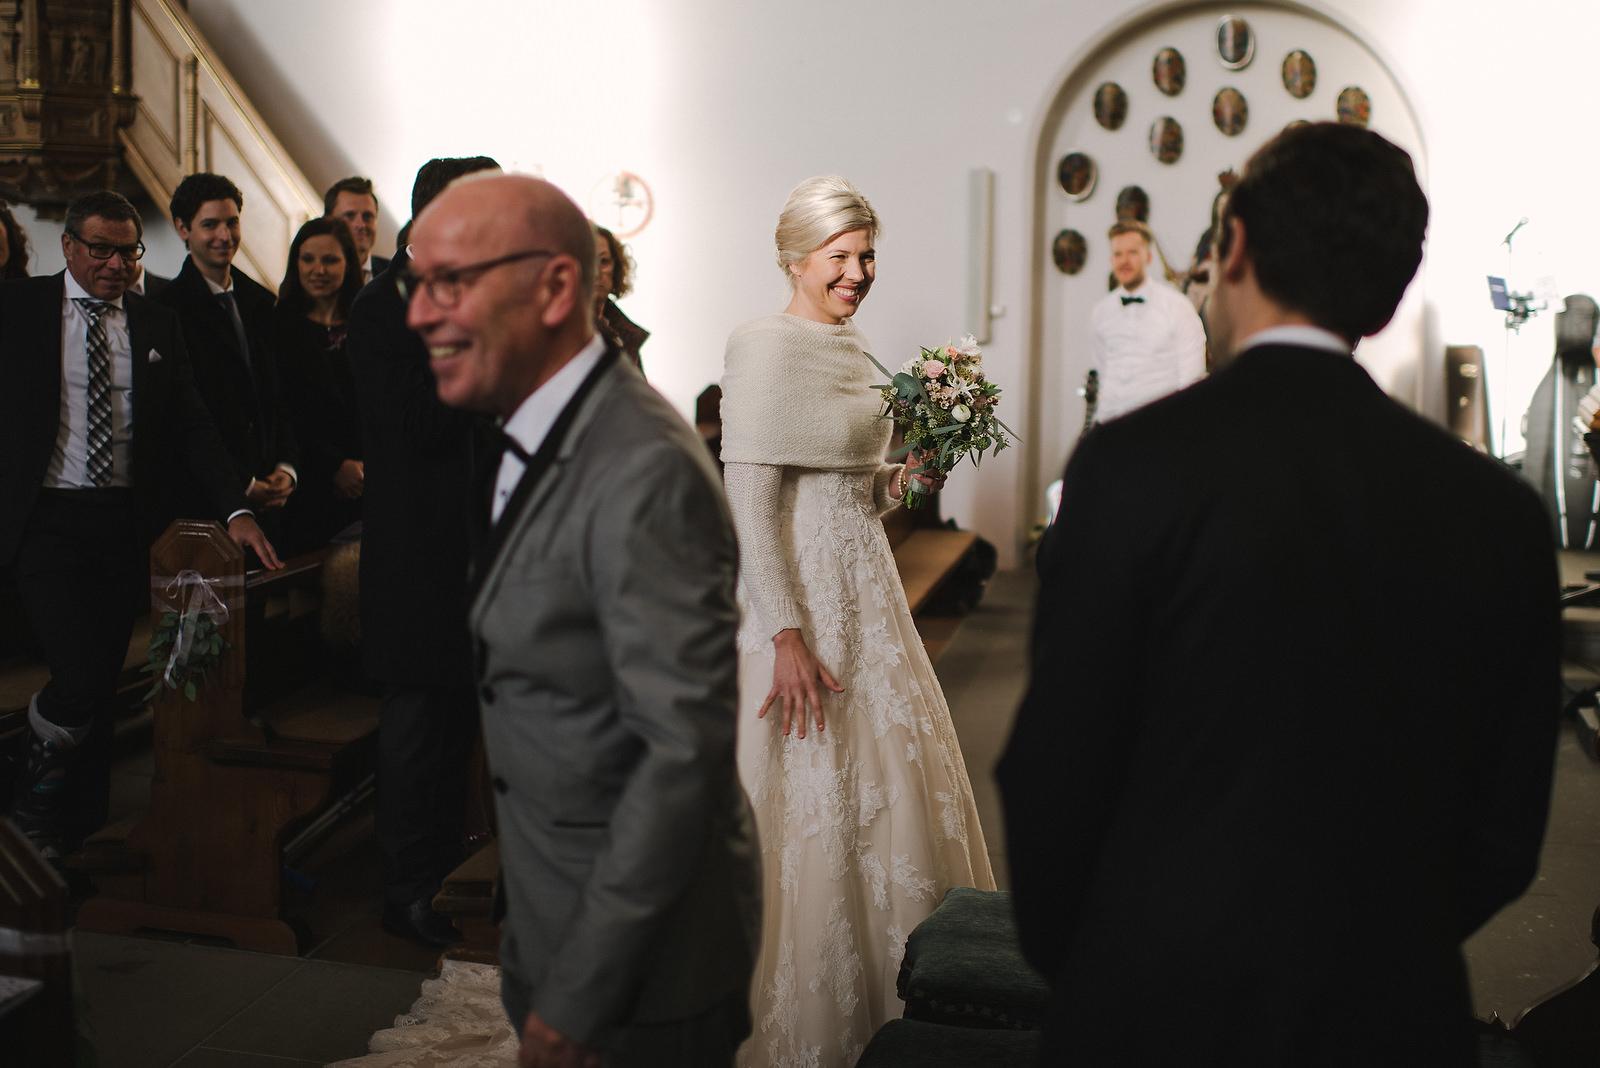 Fotograf Konstanz - Silvester Wedding in Hagnau / Friedrichshafen at Lake of Constance  - 10 -